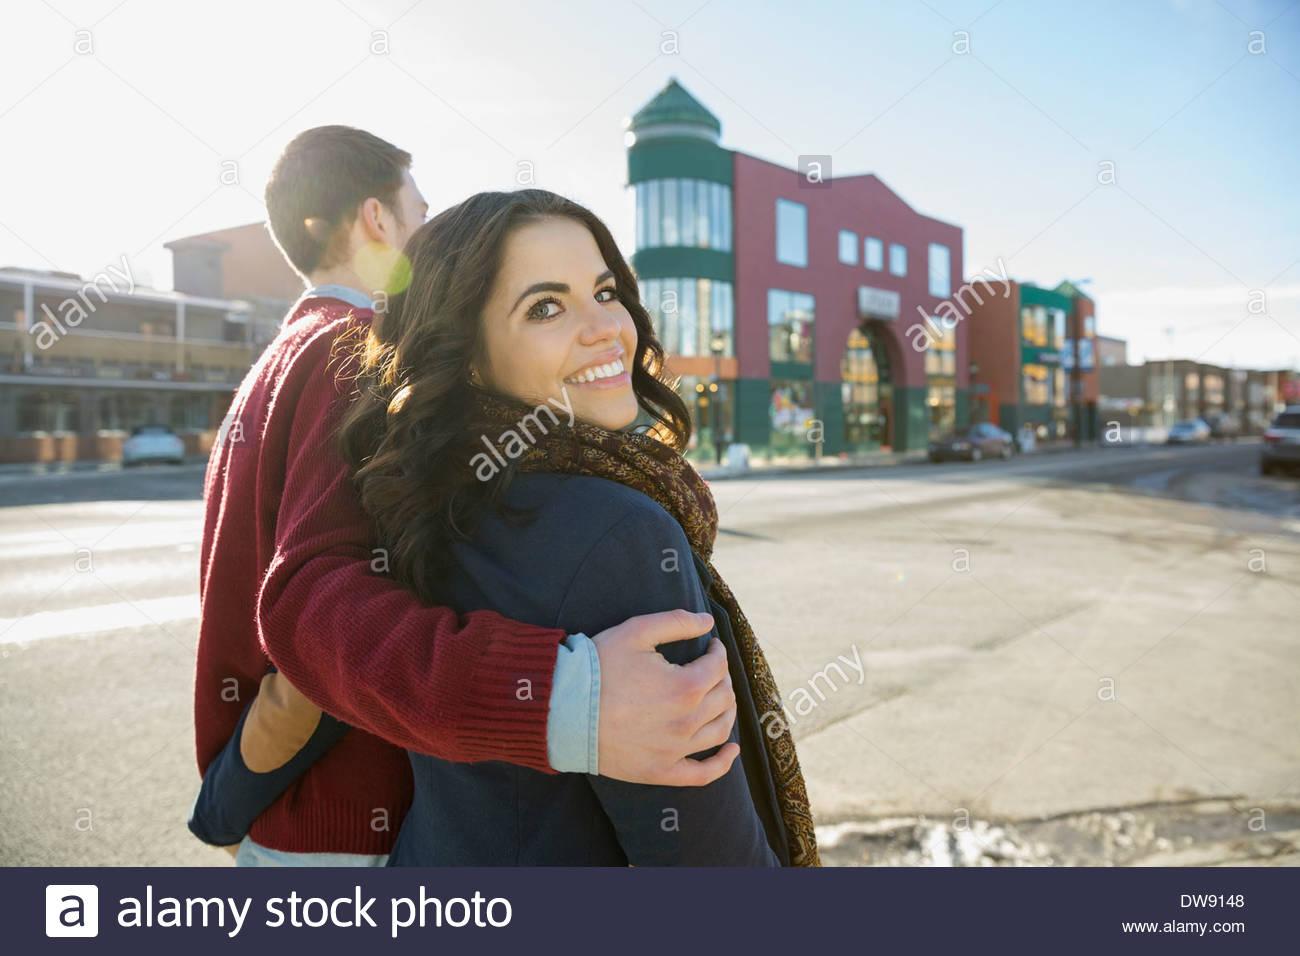 Couple walking down city street - Stock Image